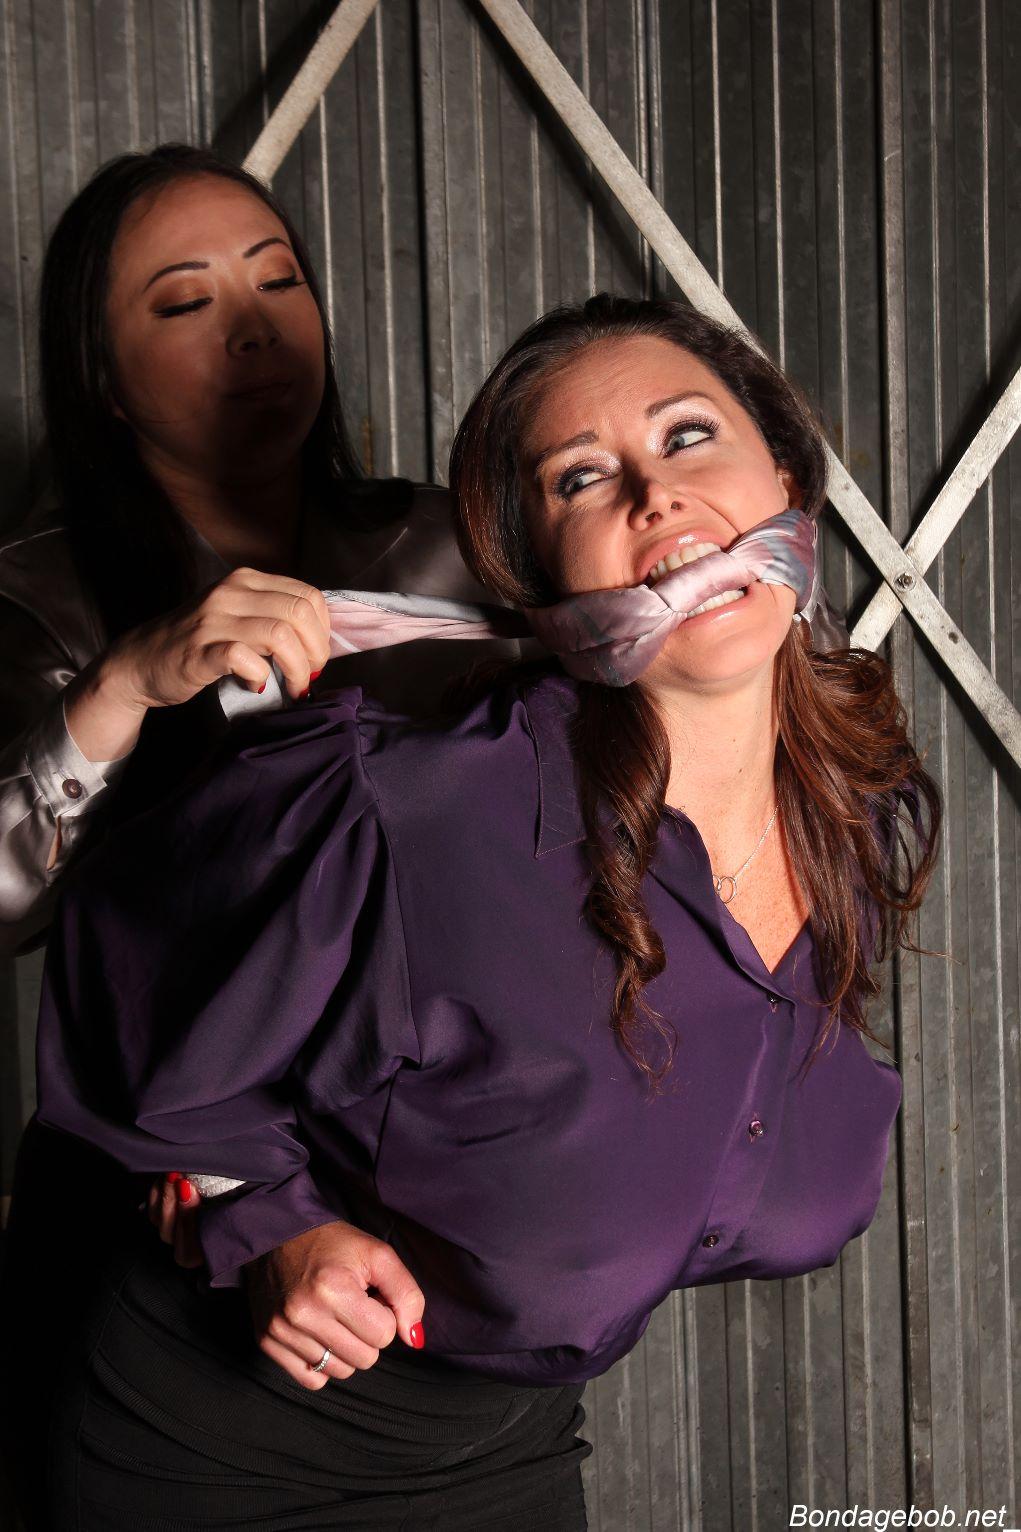 Nyssa Nevers Christina Carter in bondage.